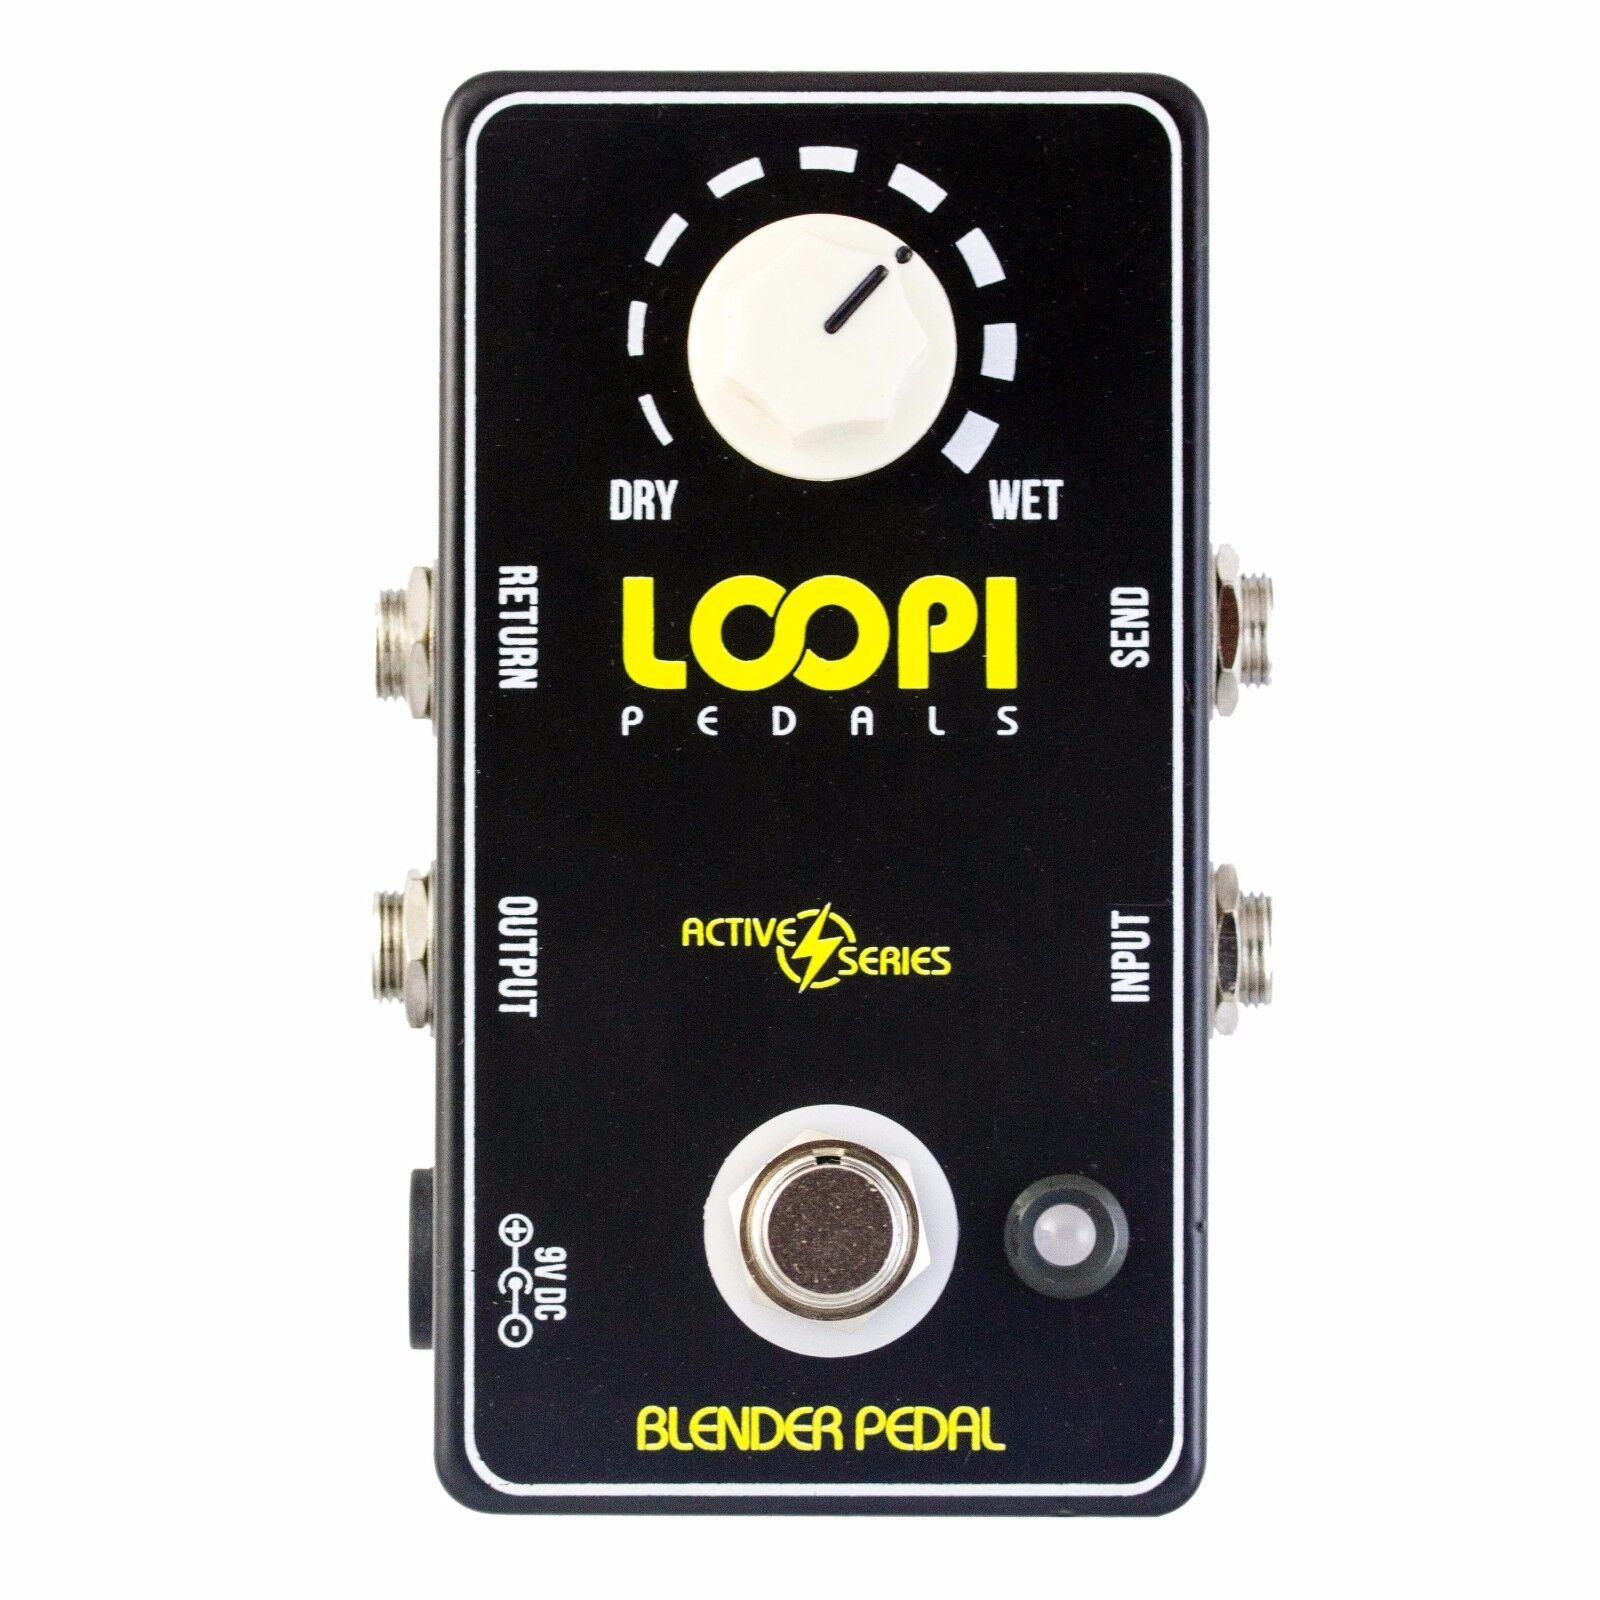 Blender Pedal - True Bypass - Loopi Pedals